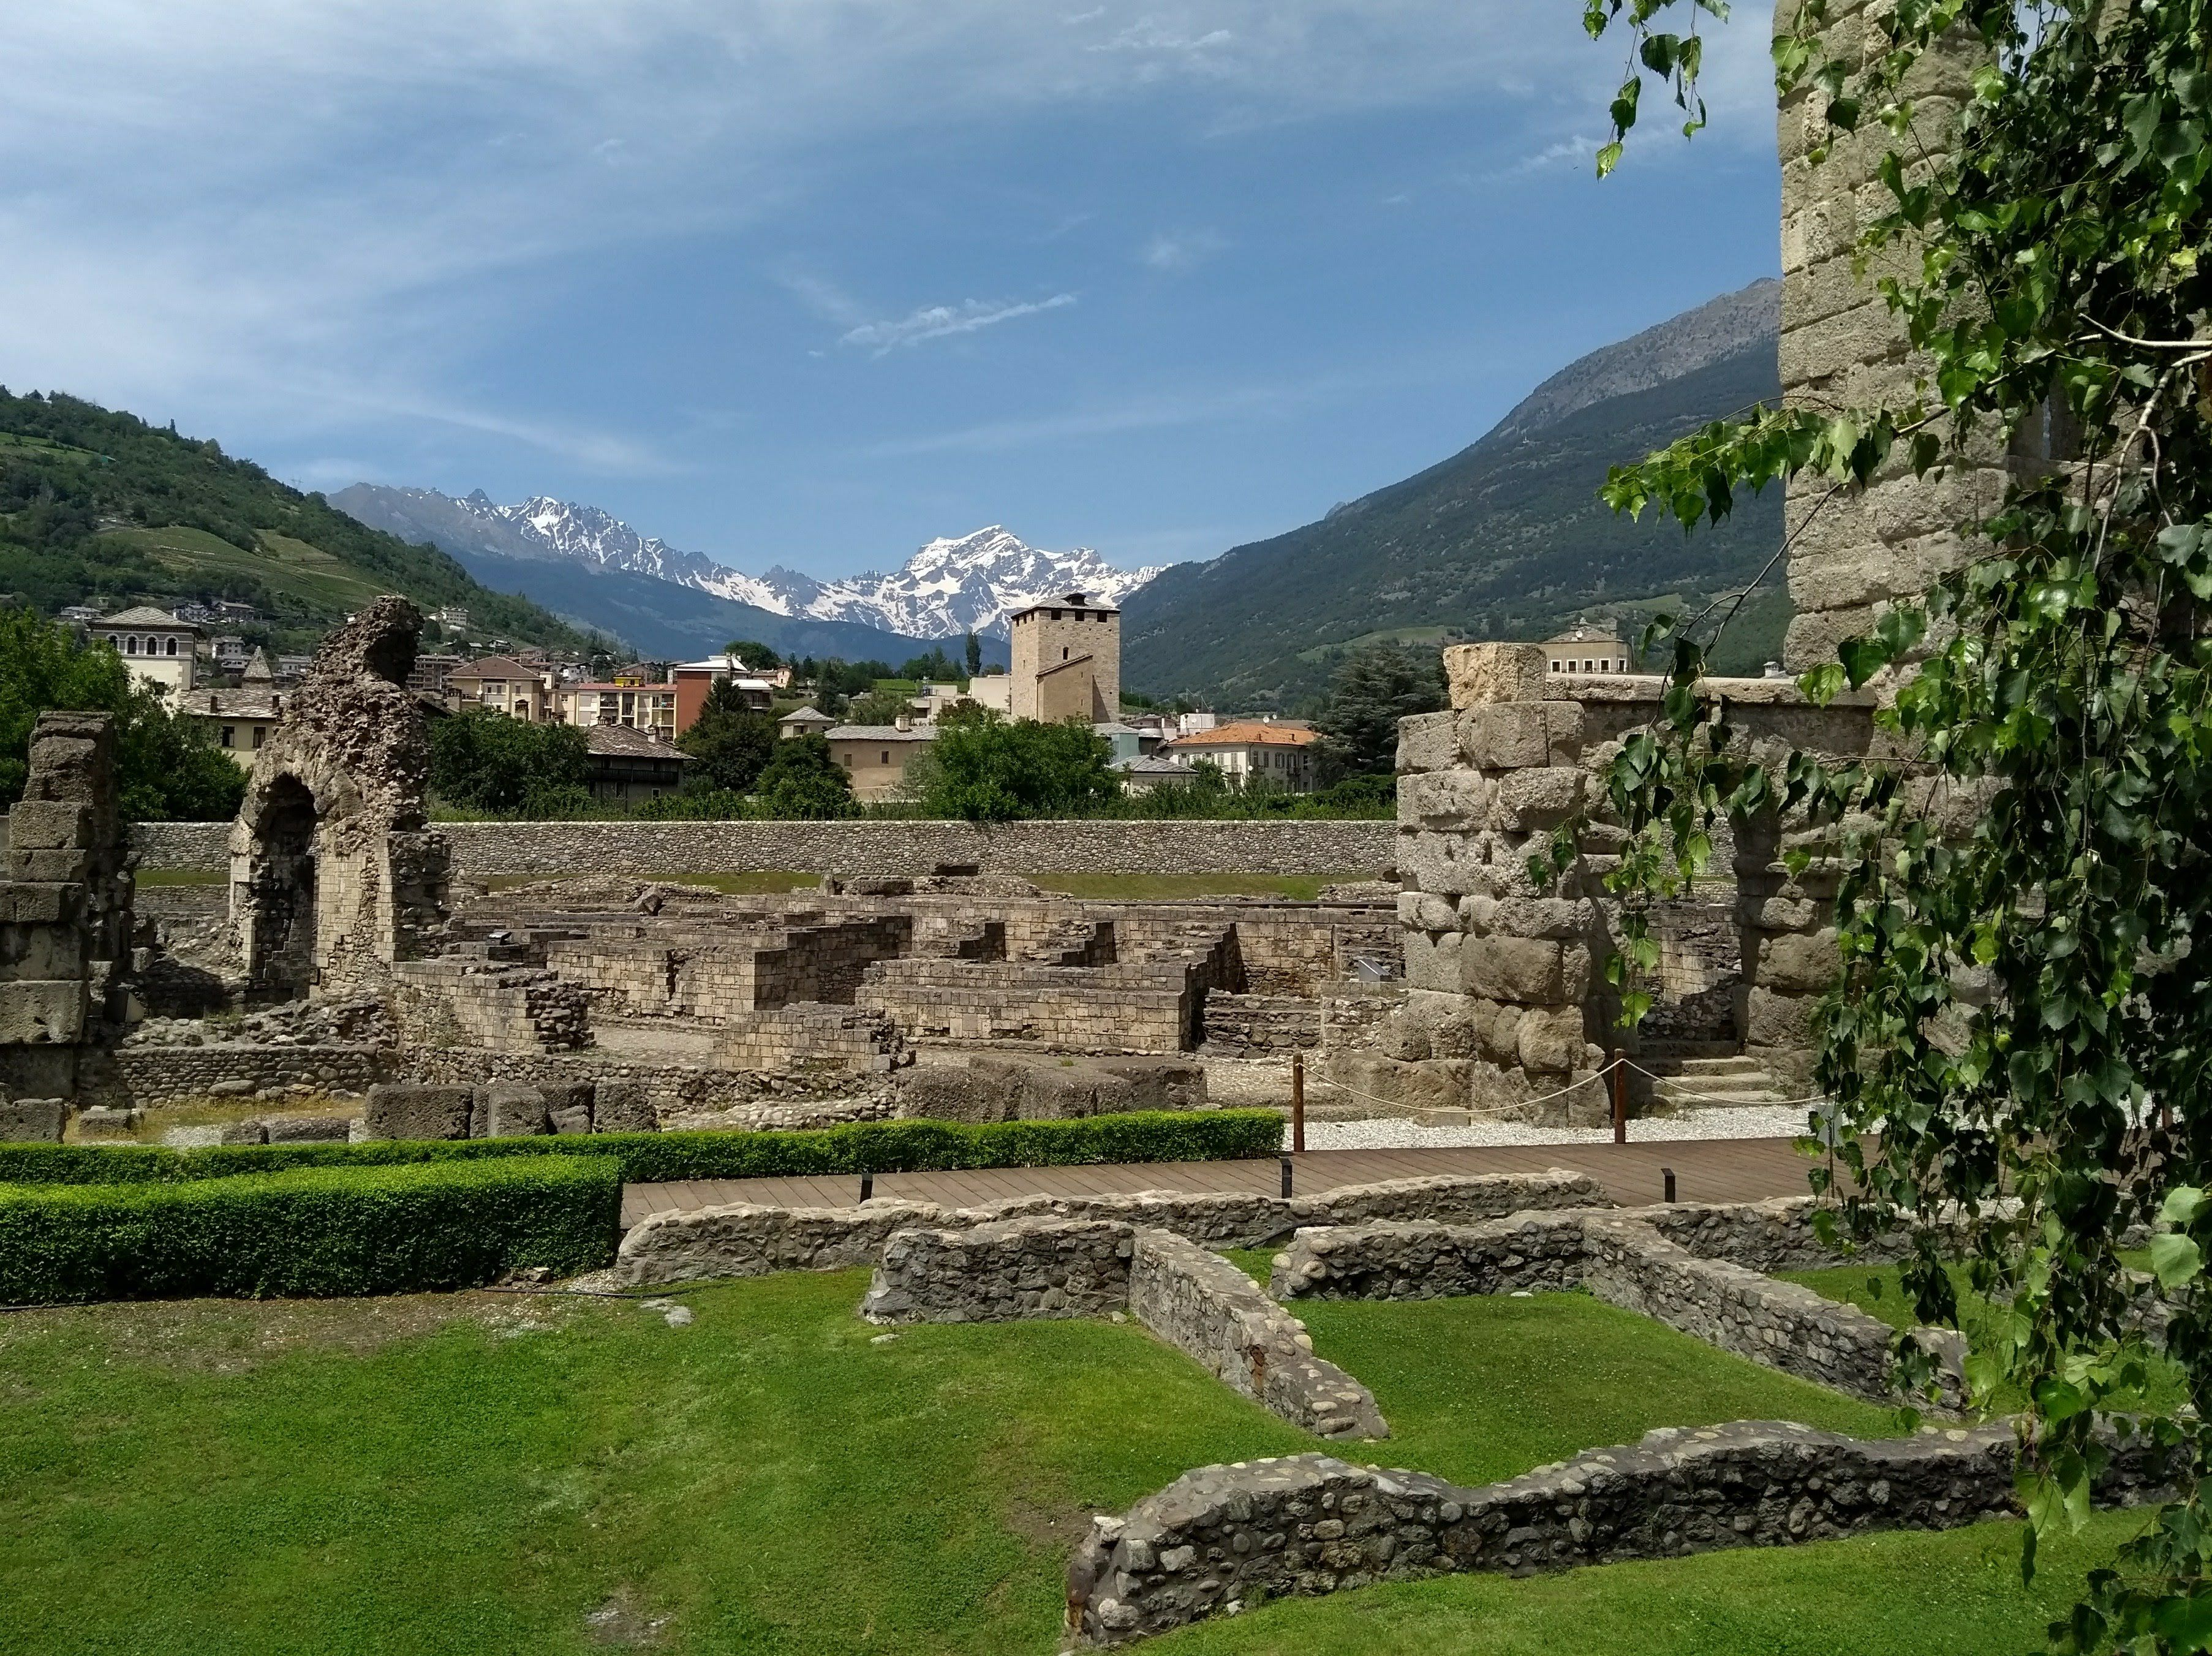 aosta valley roman ruins tour